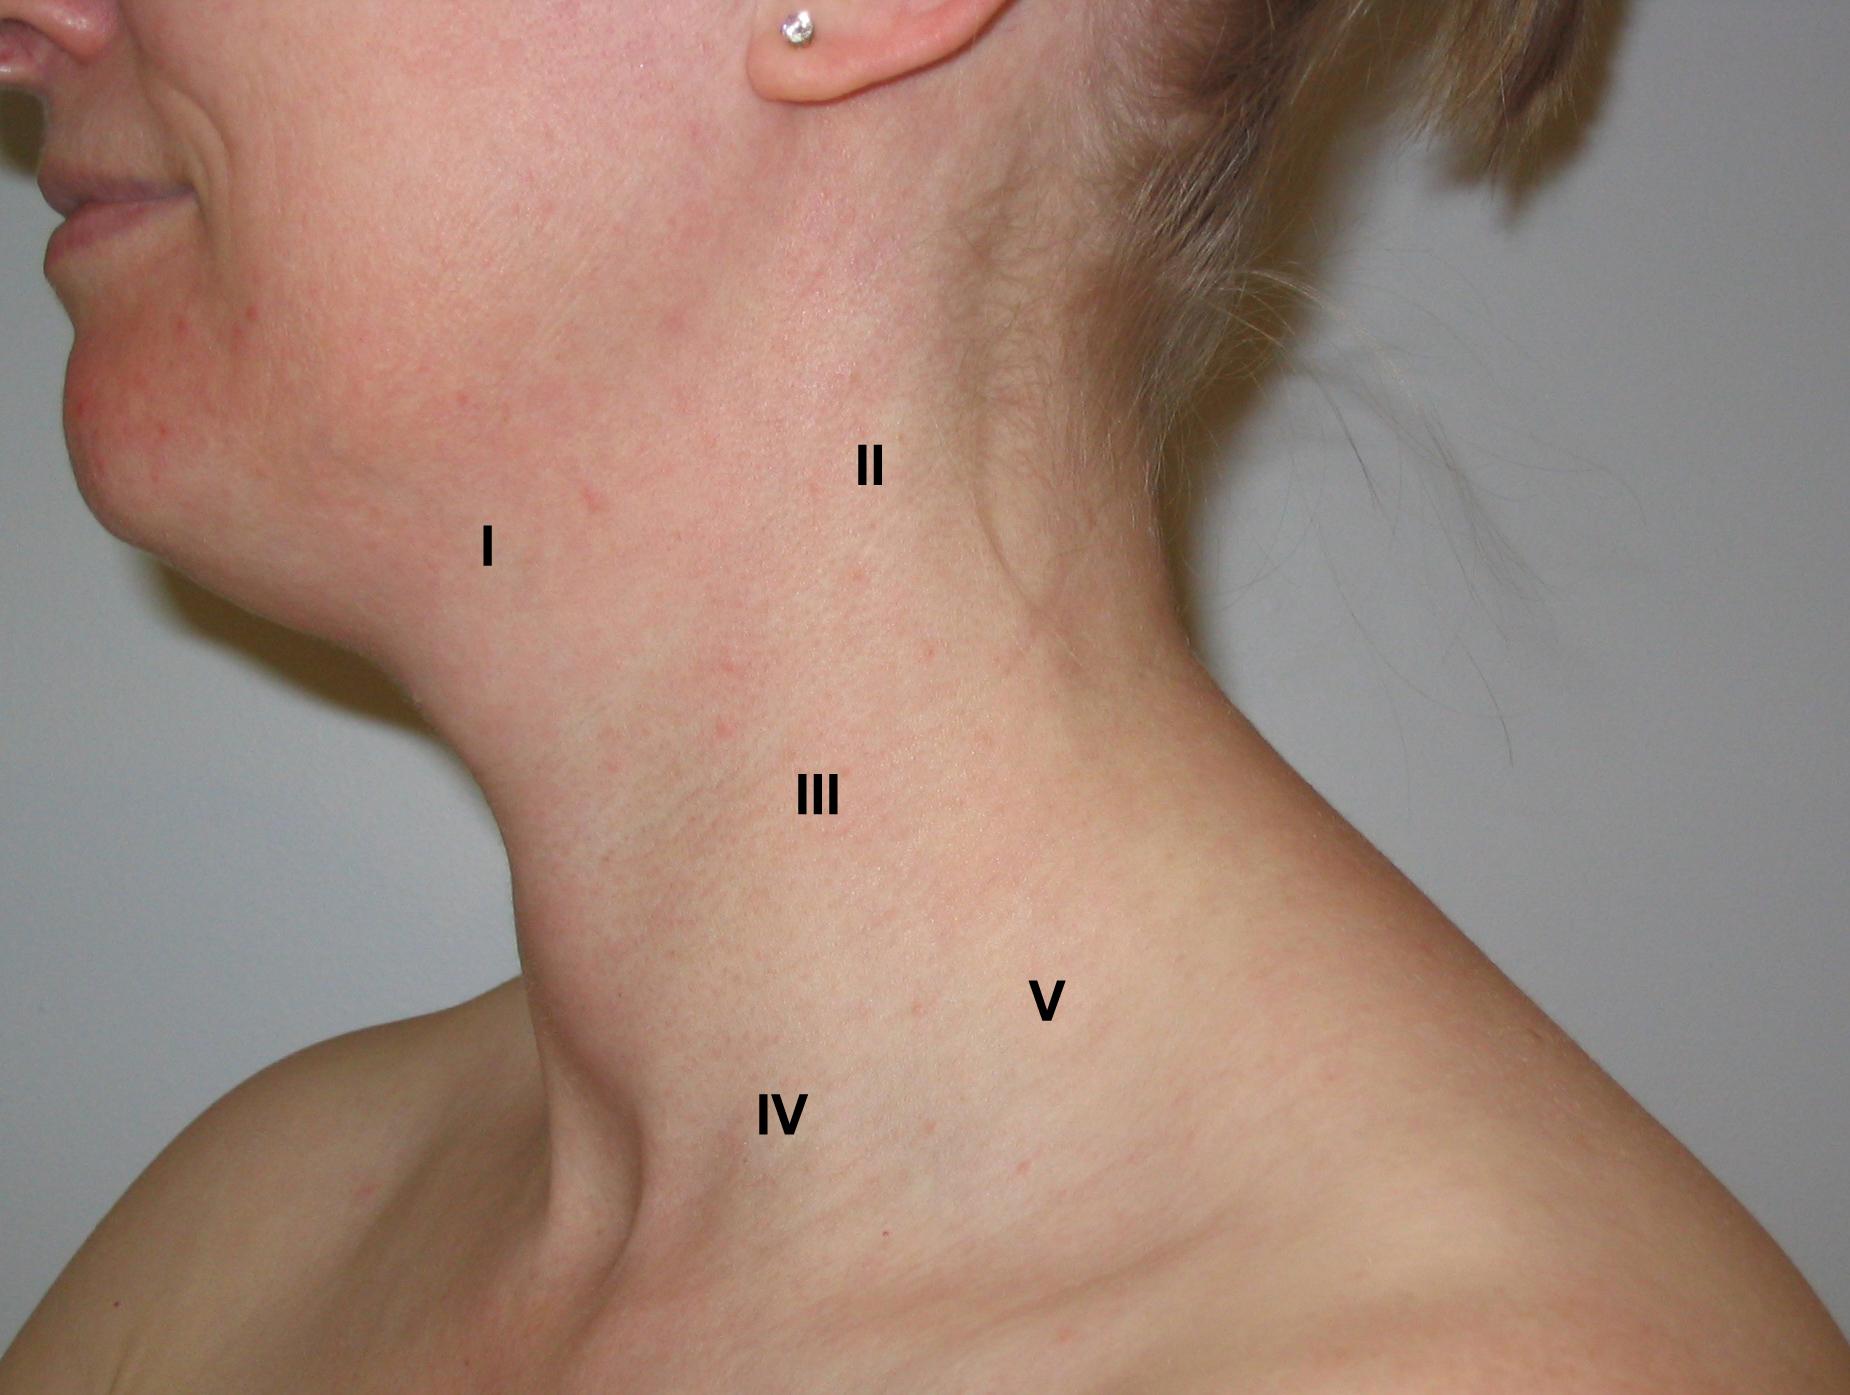 Fișier:Illu lymph node asspub.ro - Wikipedia